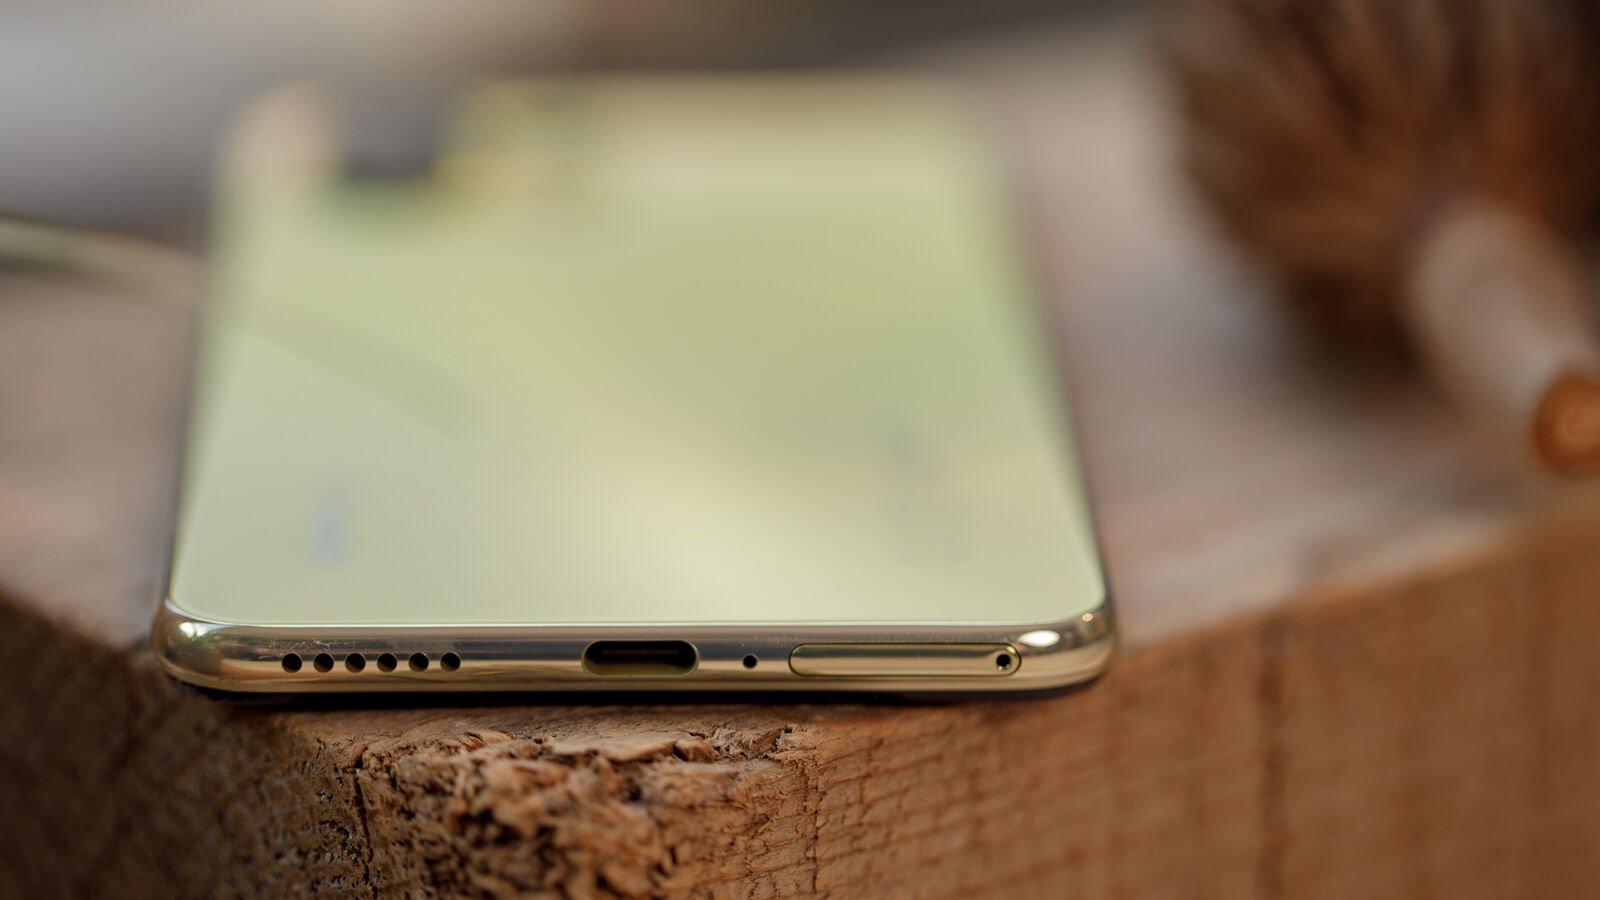 Xiaomi Mi 11 Lite 5G USB-C port